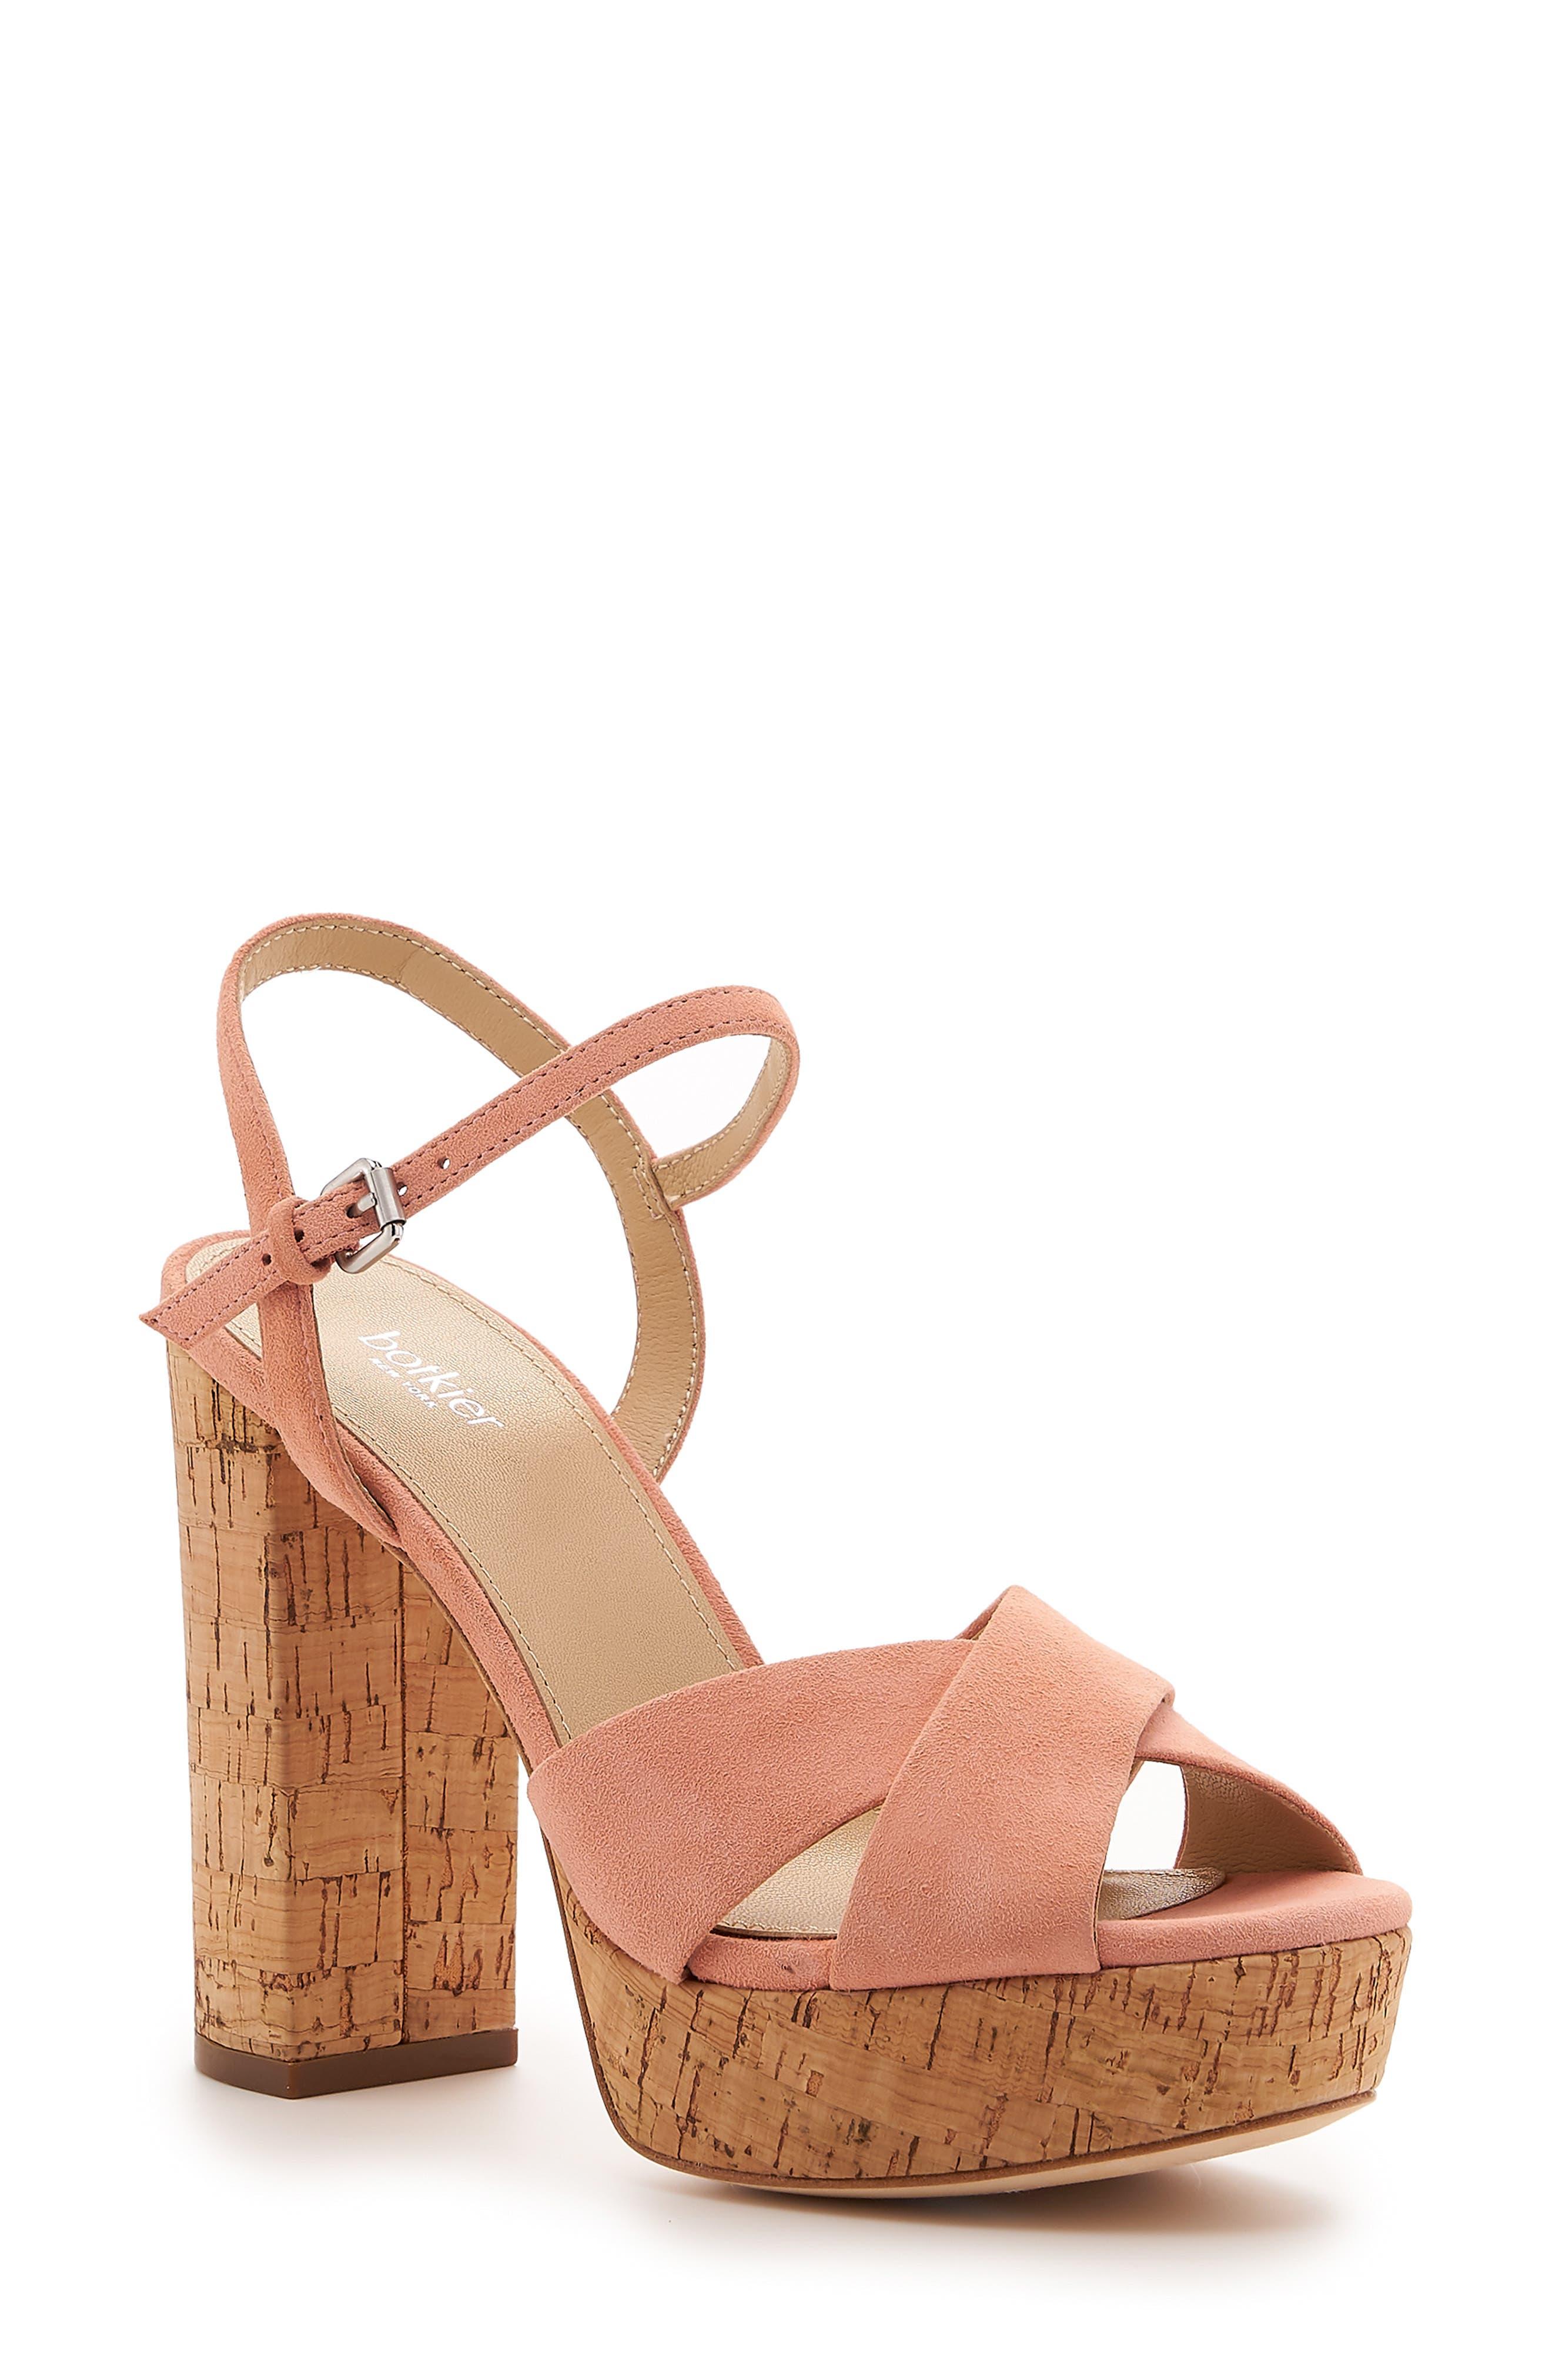 Botkier Plateau Platform Sandal, Pink